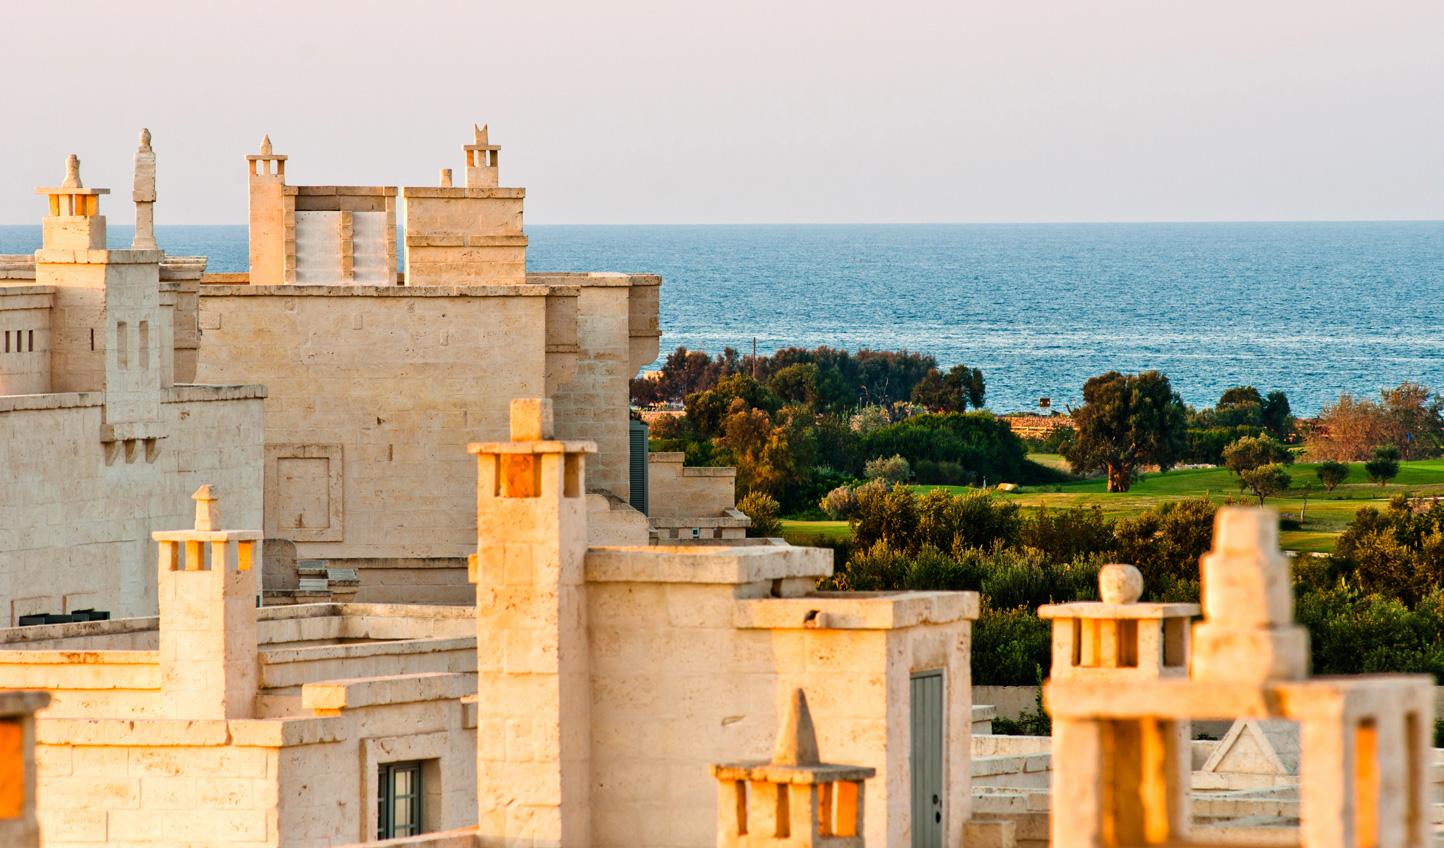 Settle in at Borgo Egnazia and soak in the sea views